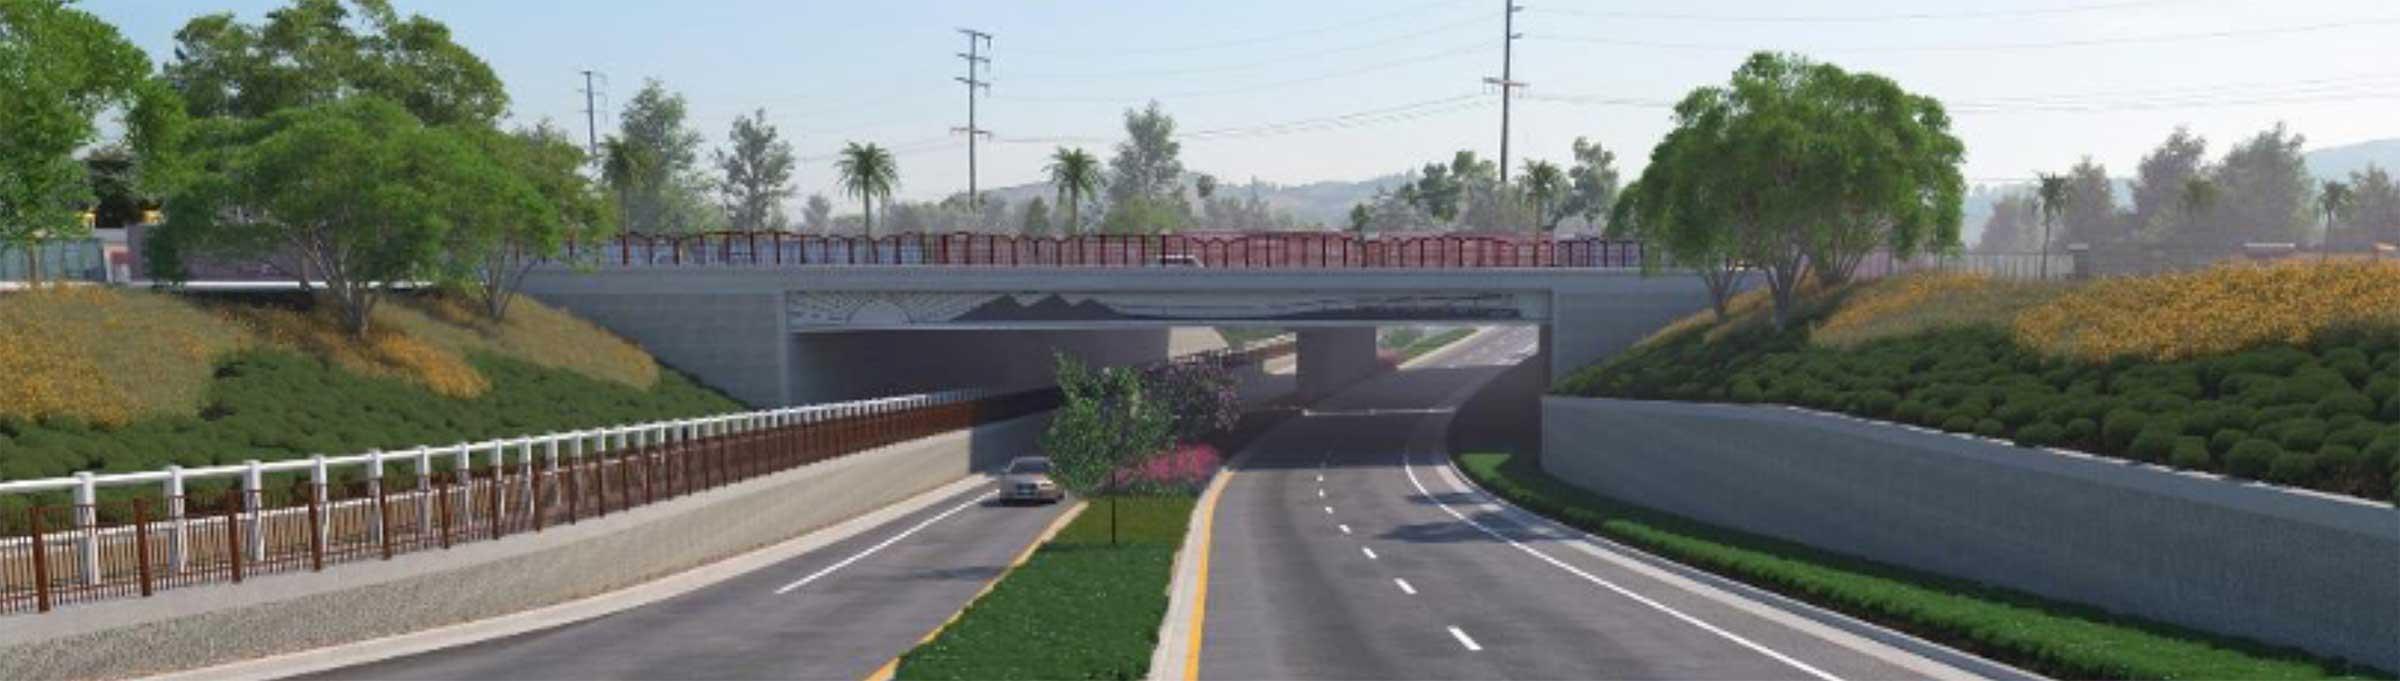 Jurupa Road Grade Separation project road